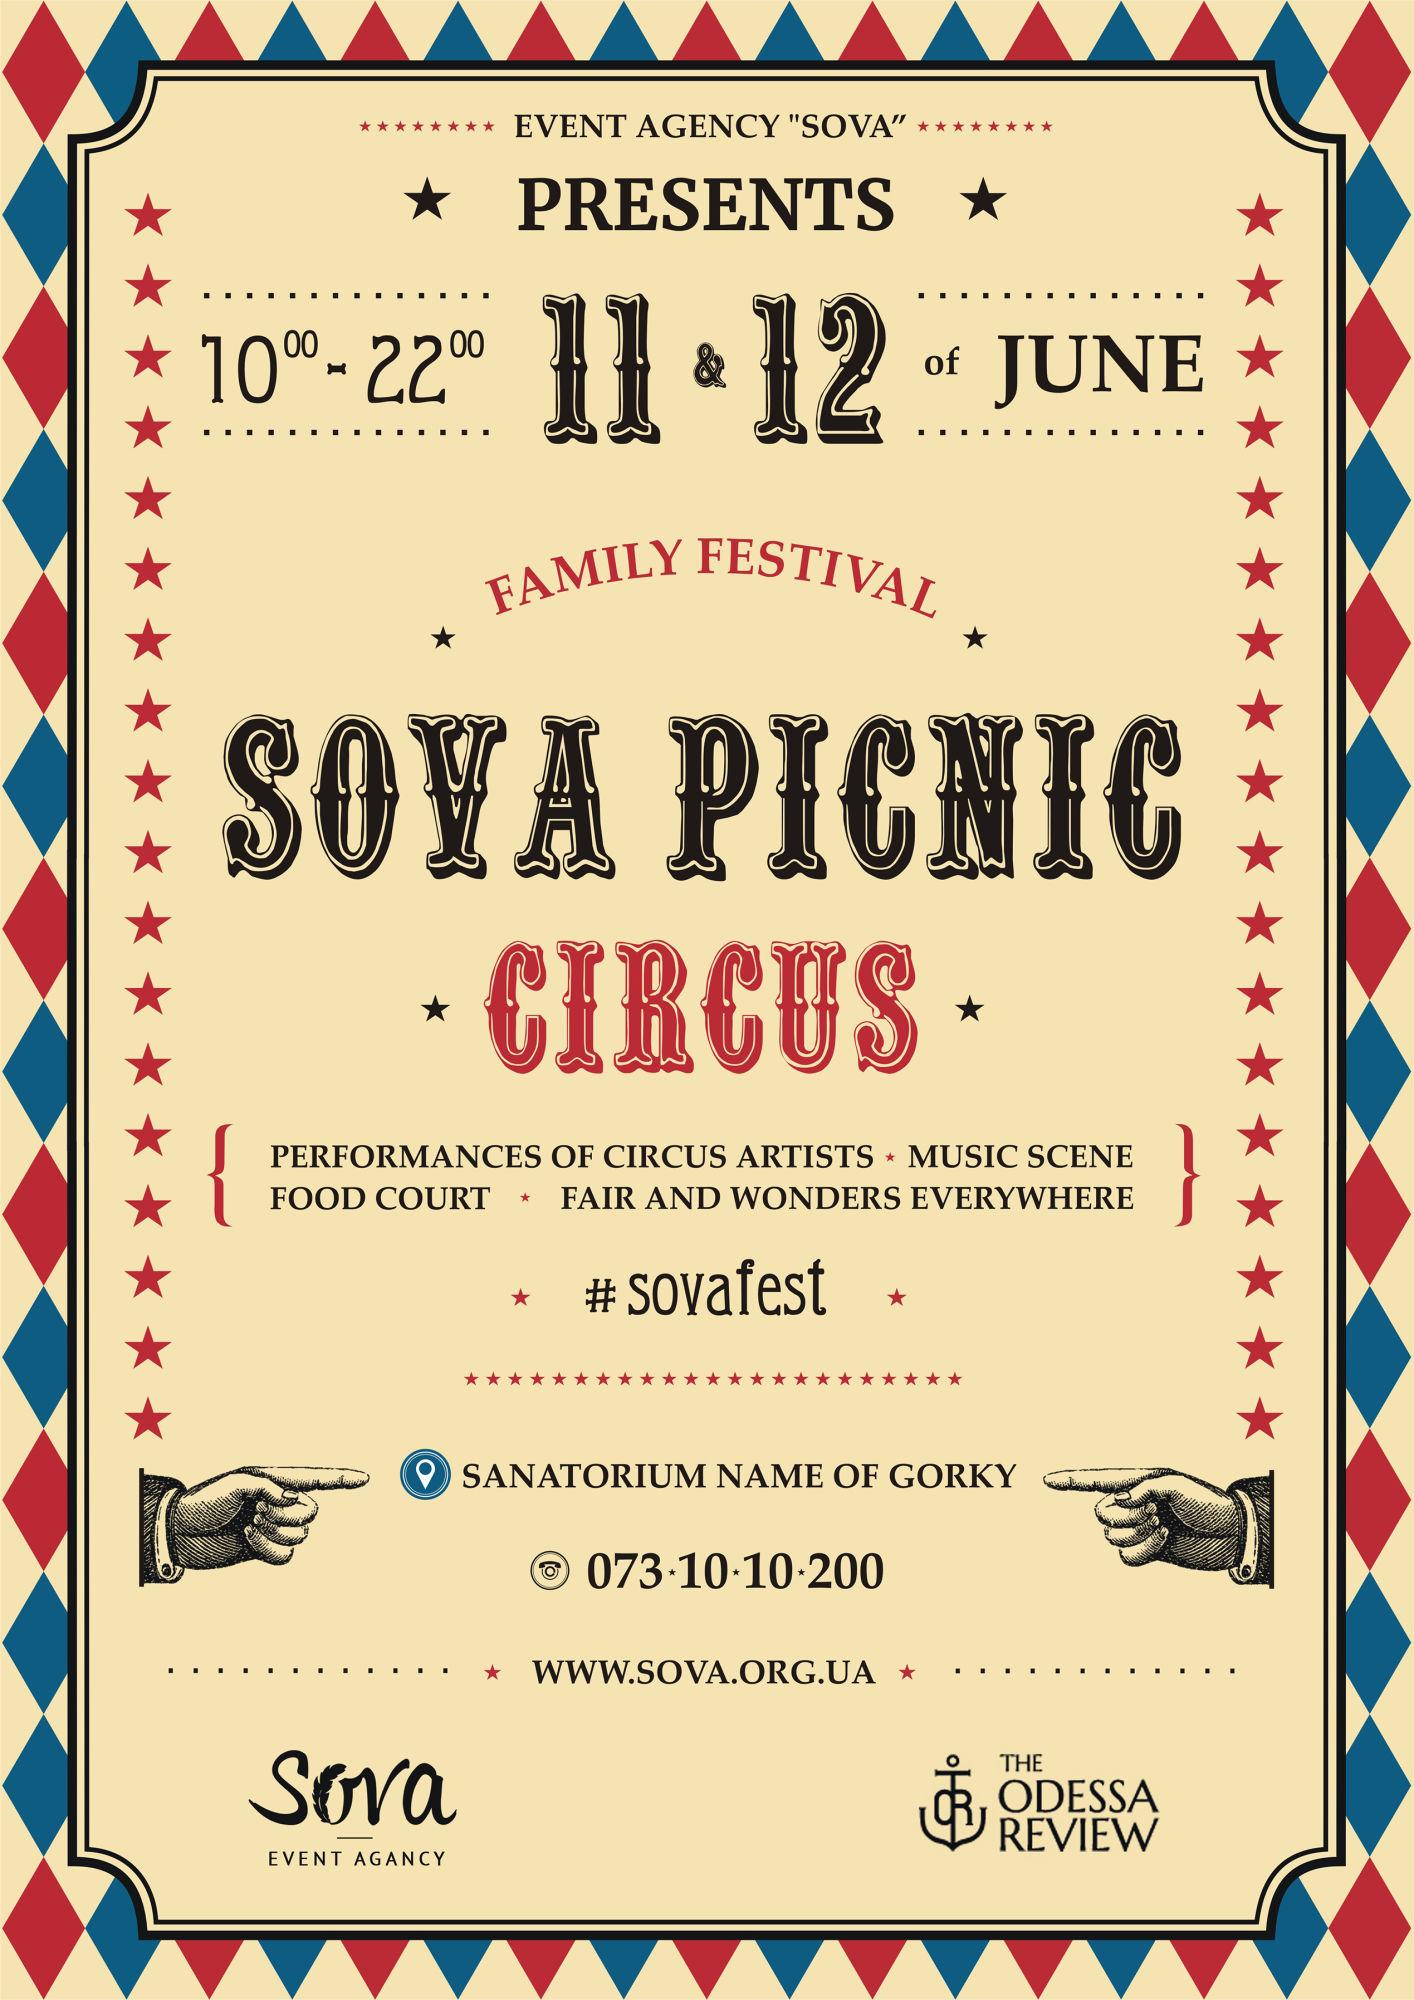 sova_picnic_circus_Eng_a3